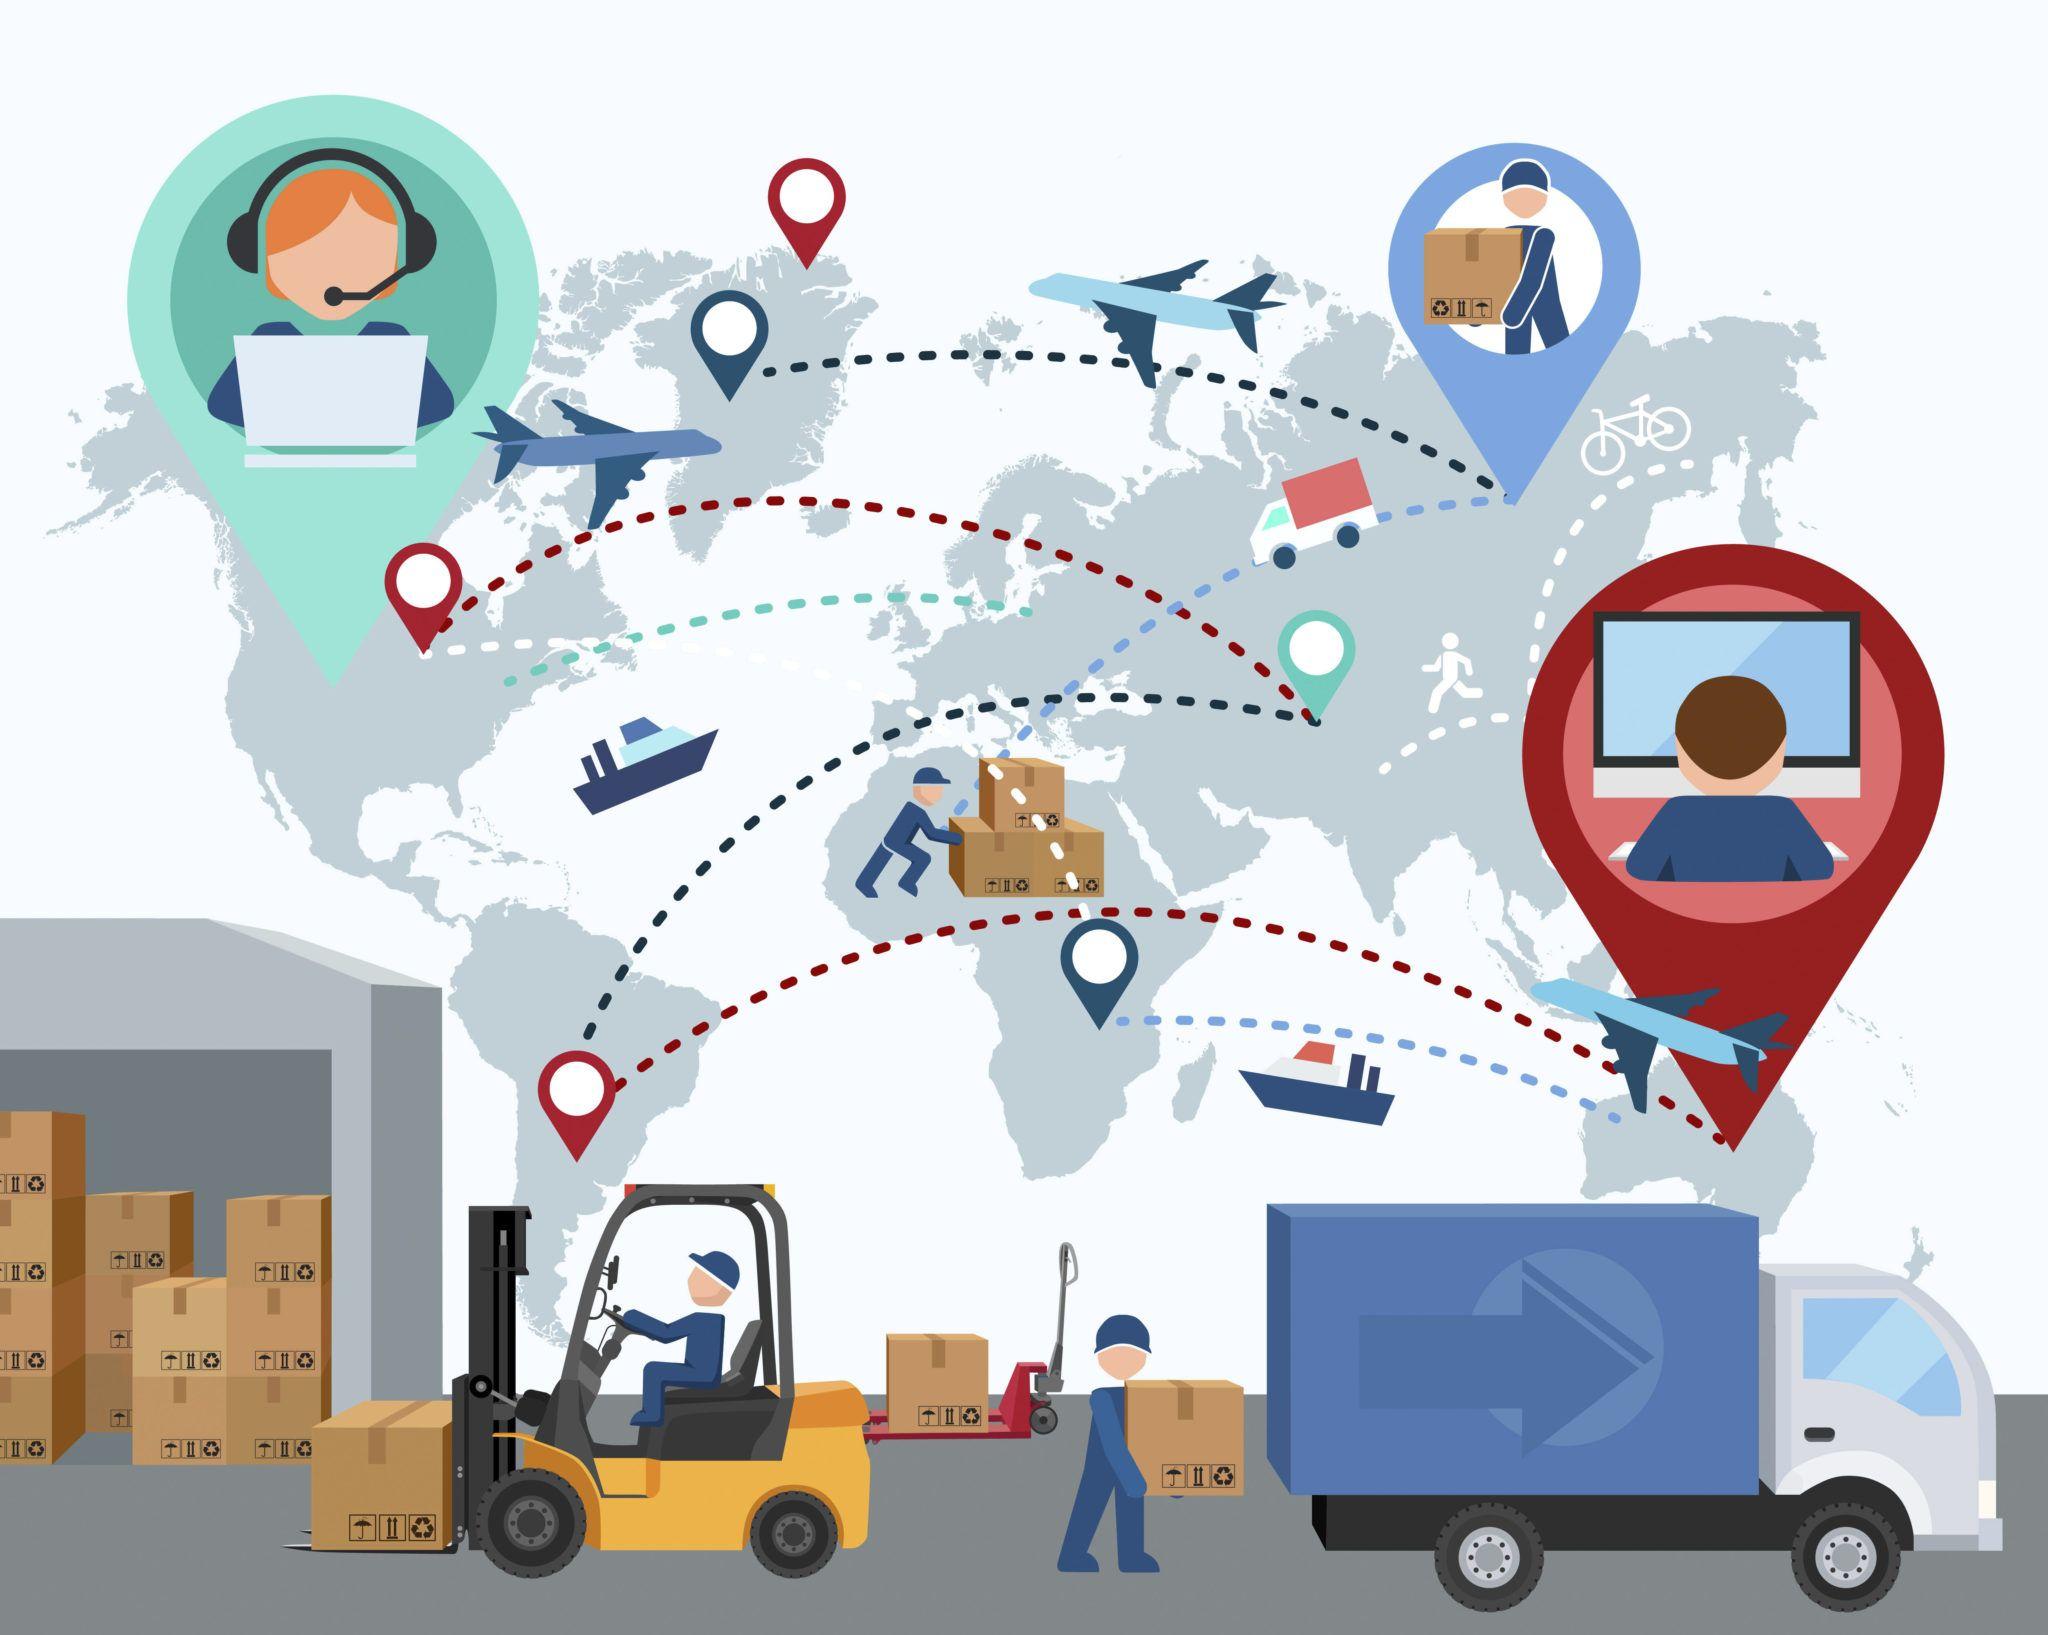 Pin by Neeraj kumar on Image Shack   Supply chain management